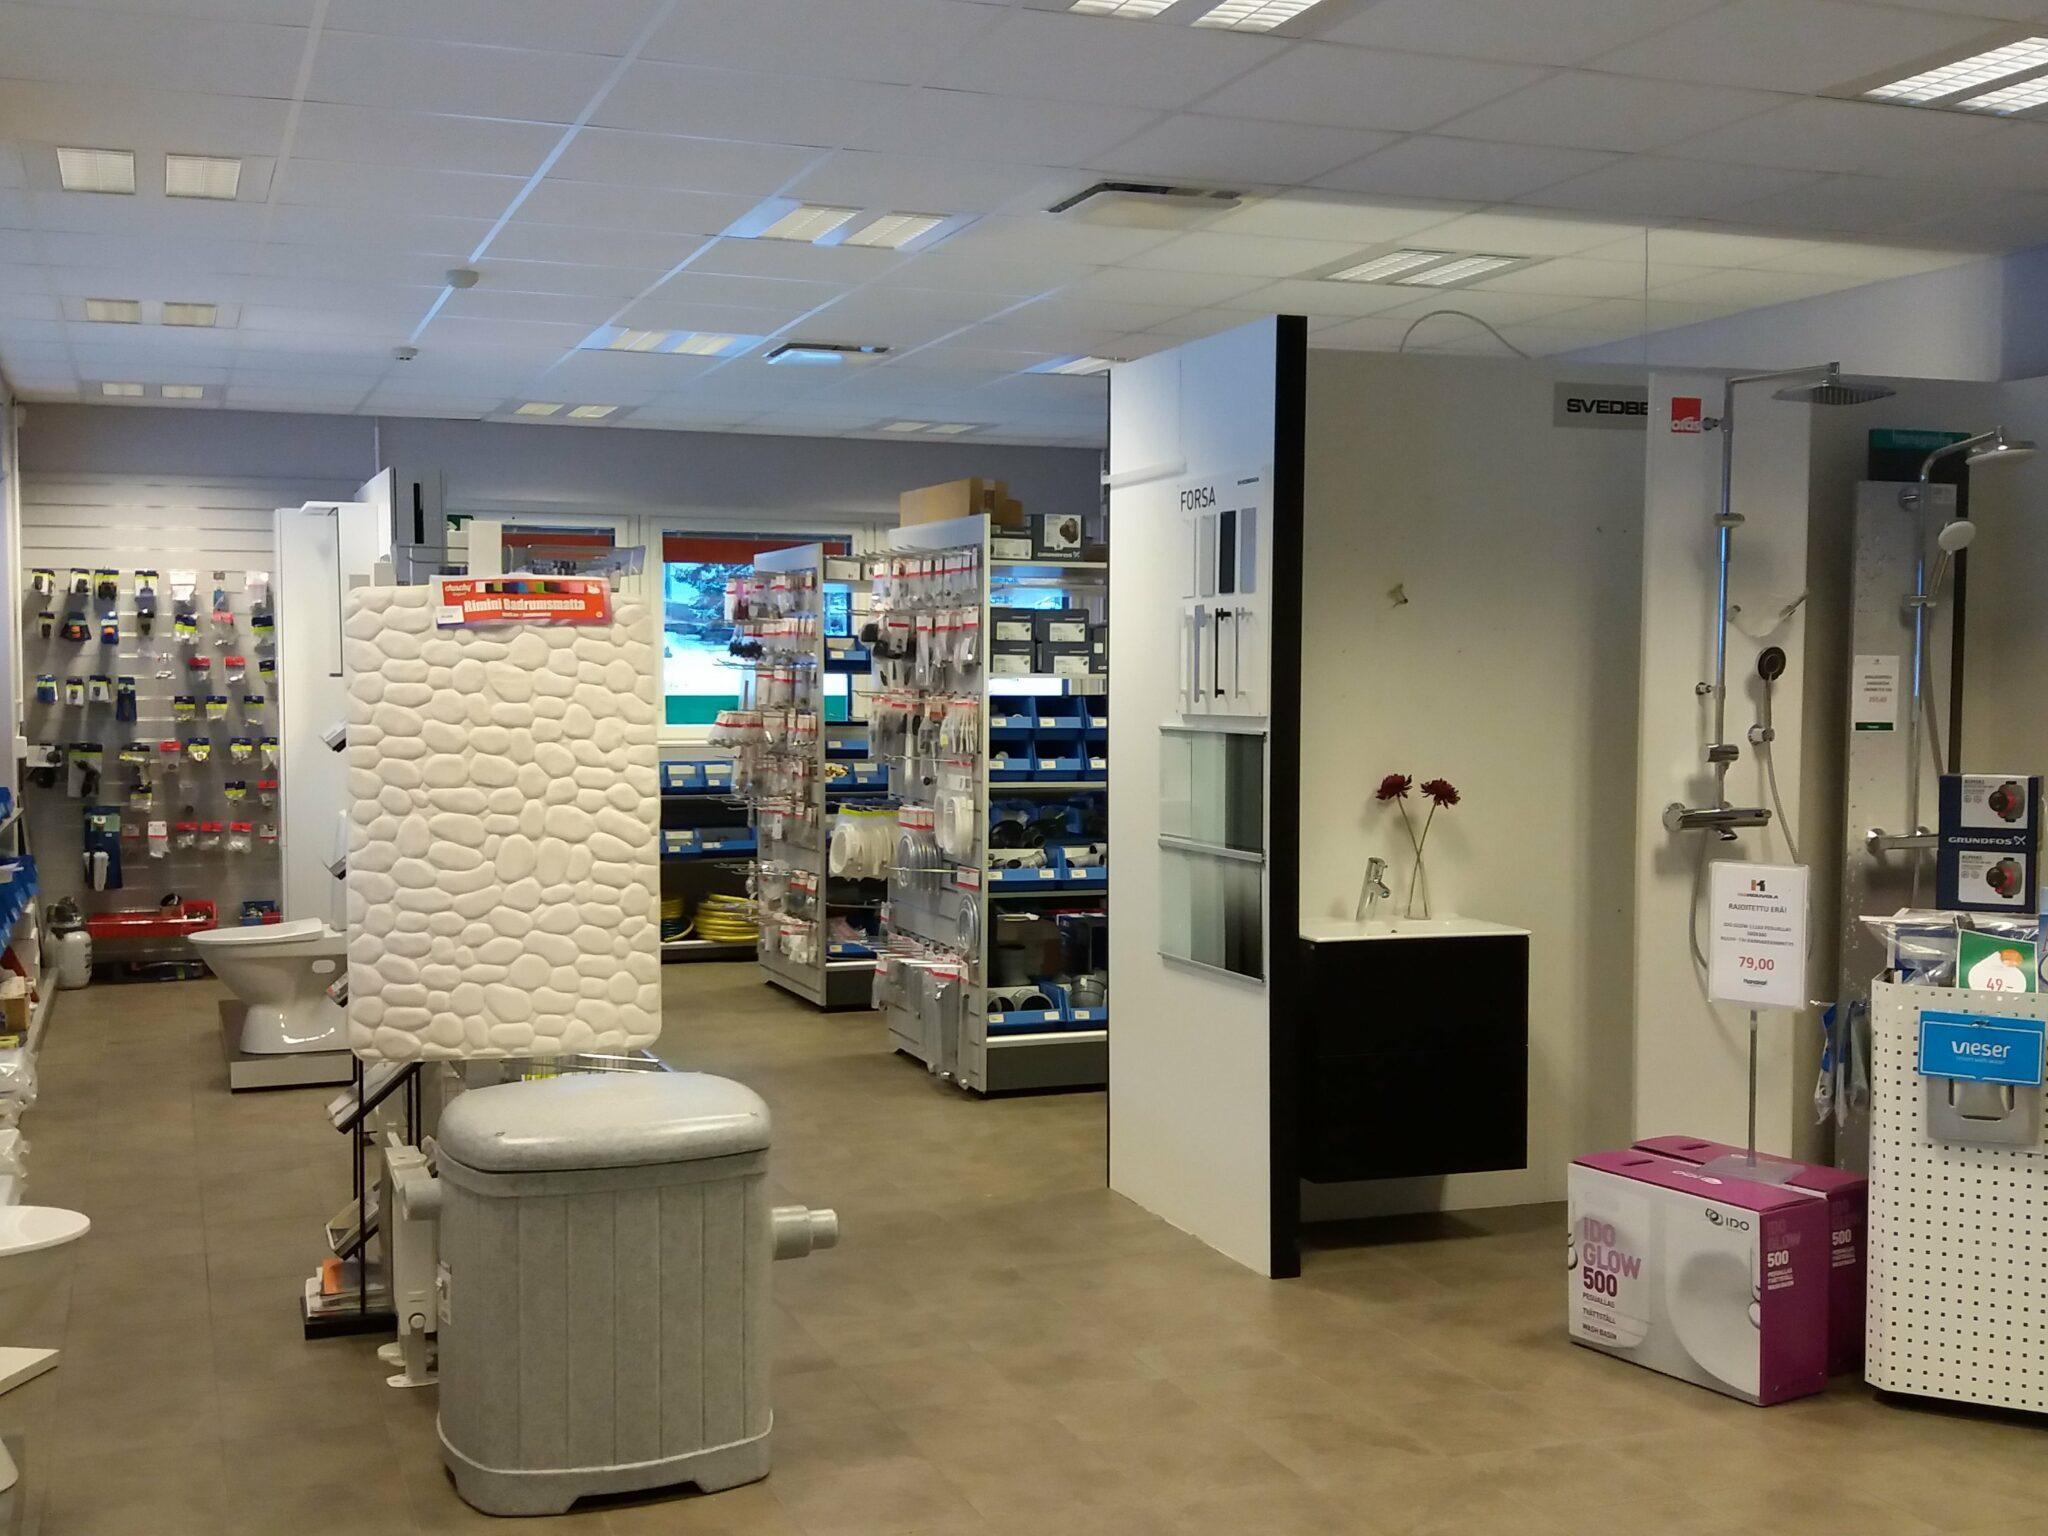 Isokouvola LVI Turku, Tampere & Varsinais-Suomi